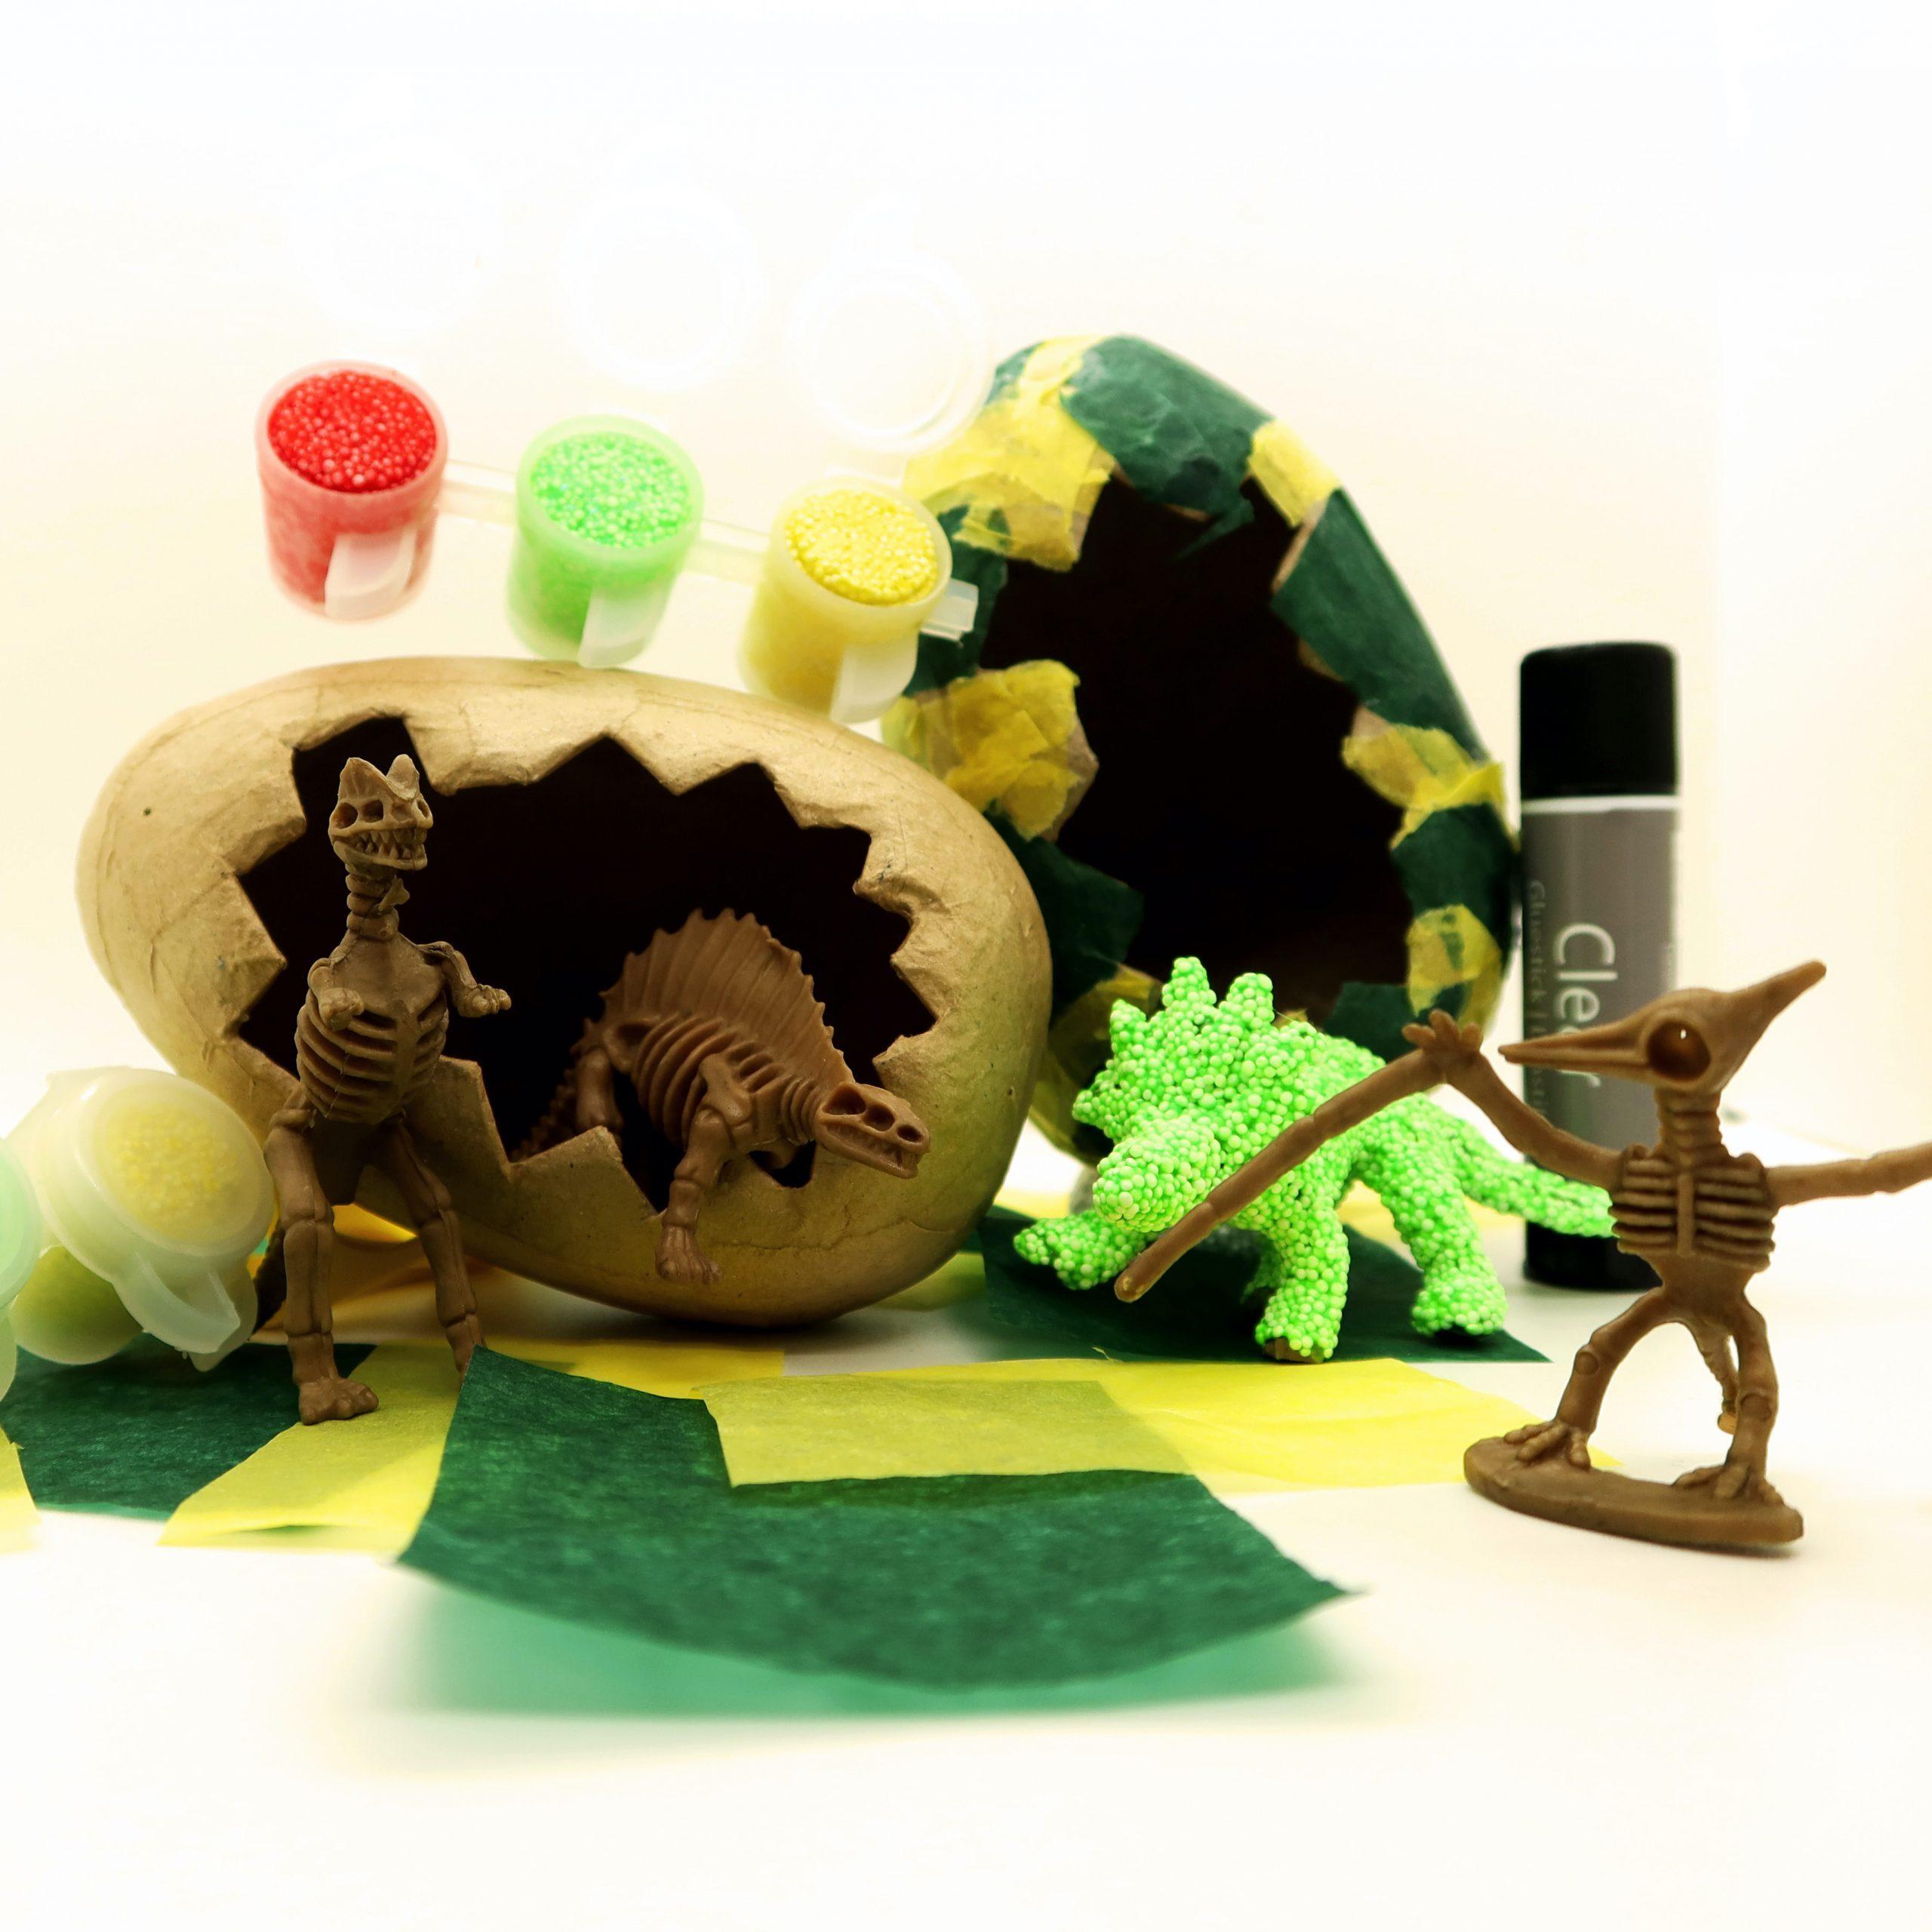 Kids + toys